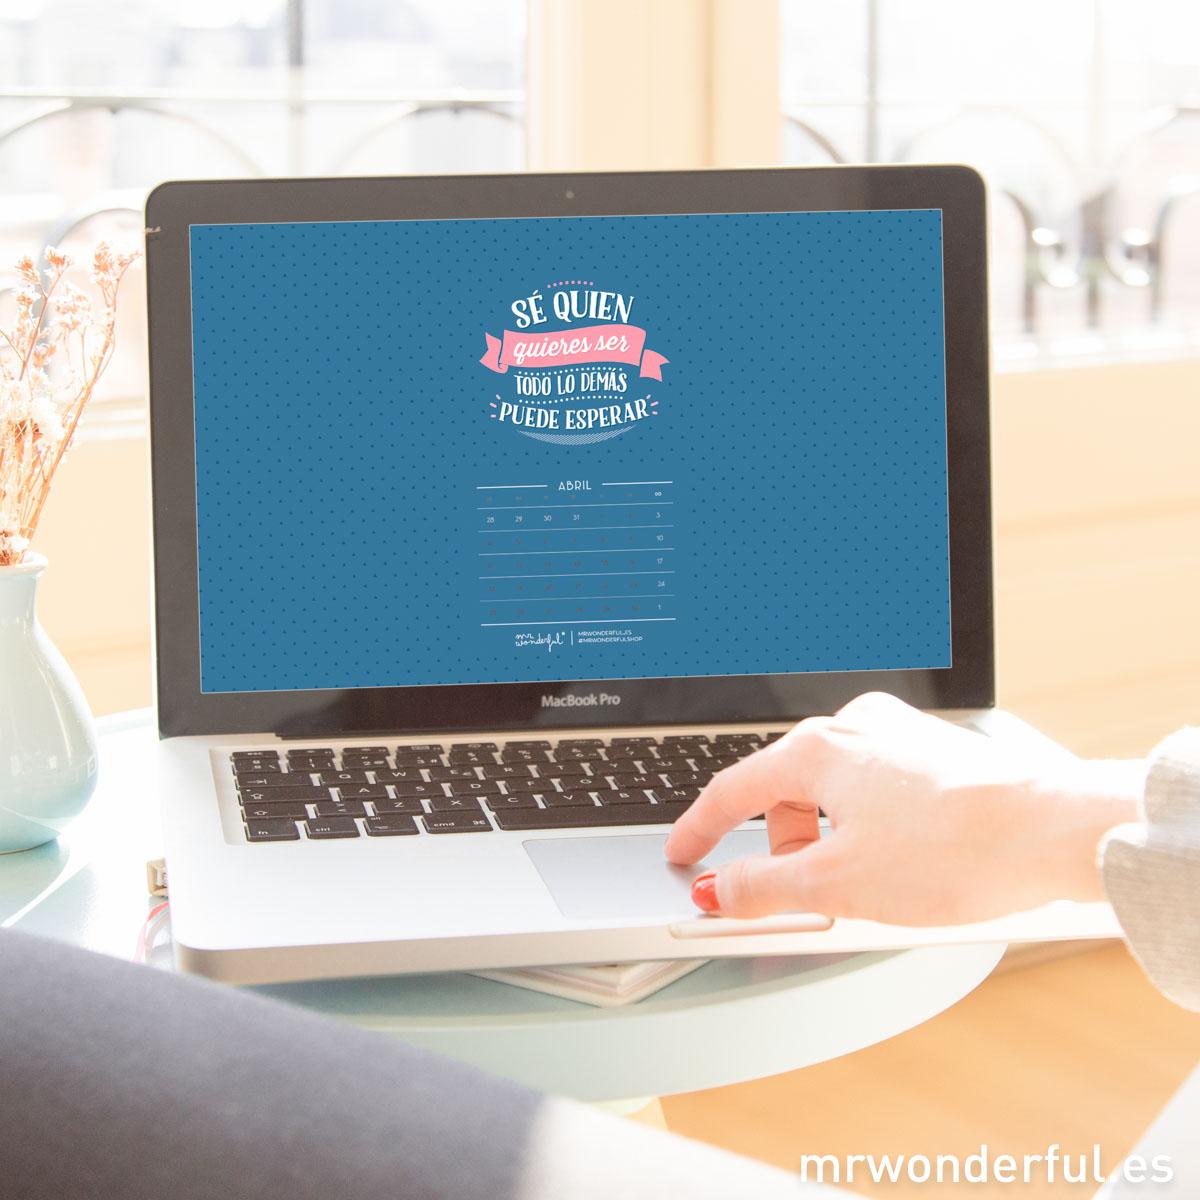 mrwonderful_descargable-fondos-pantallas-6-Editar-Editar-3